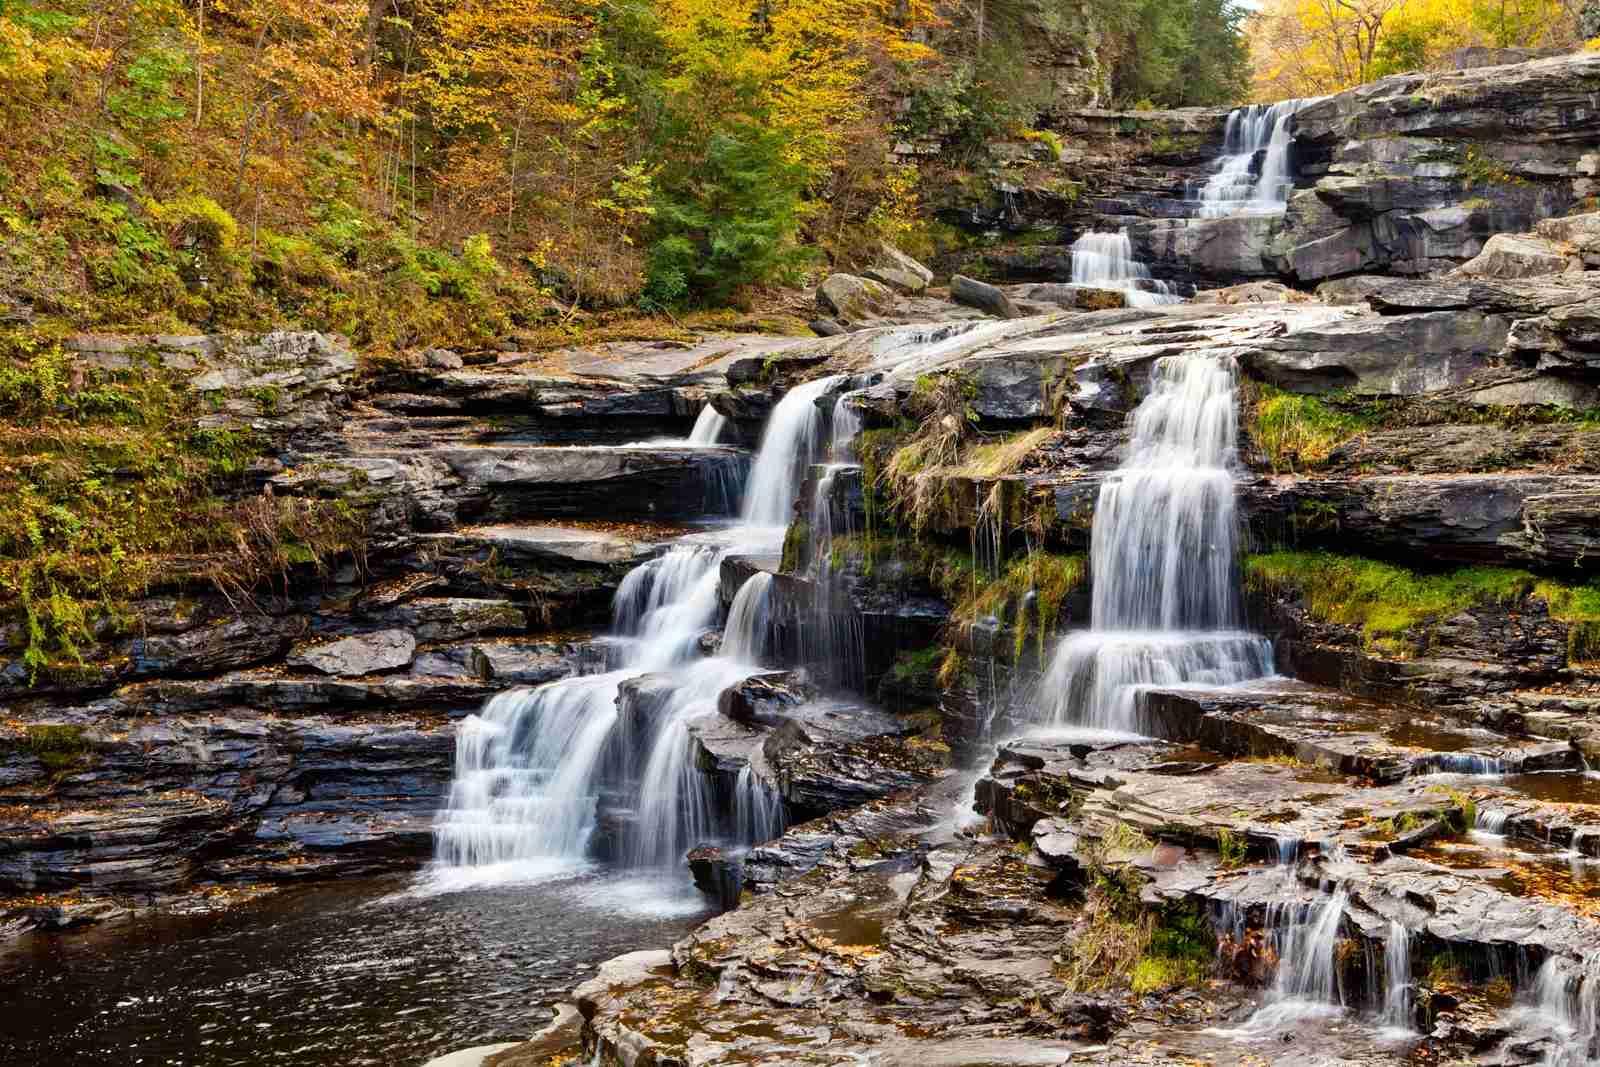 Wallenpaupack Creek Waterfalls in the Poconos. (Photo by Richard T. Nowitz/Getty Images)